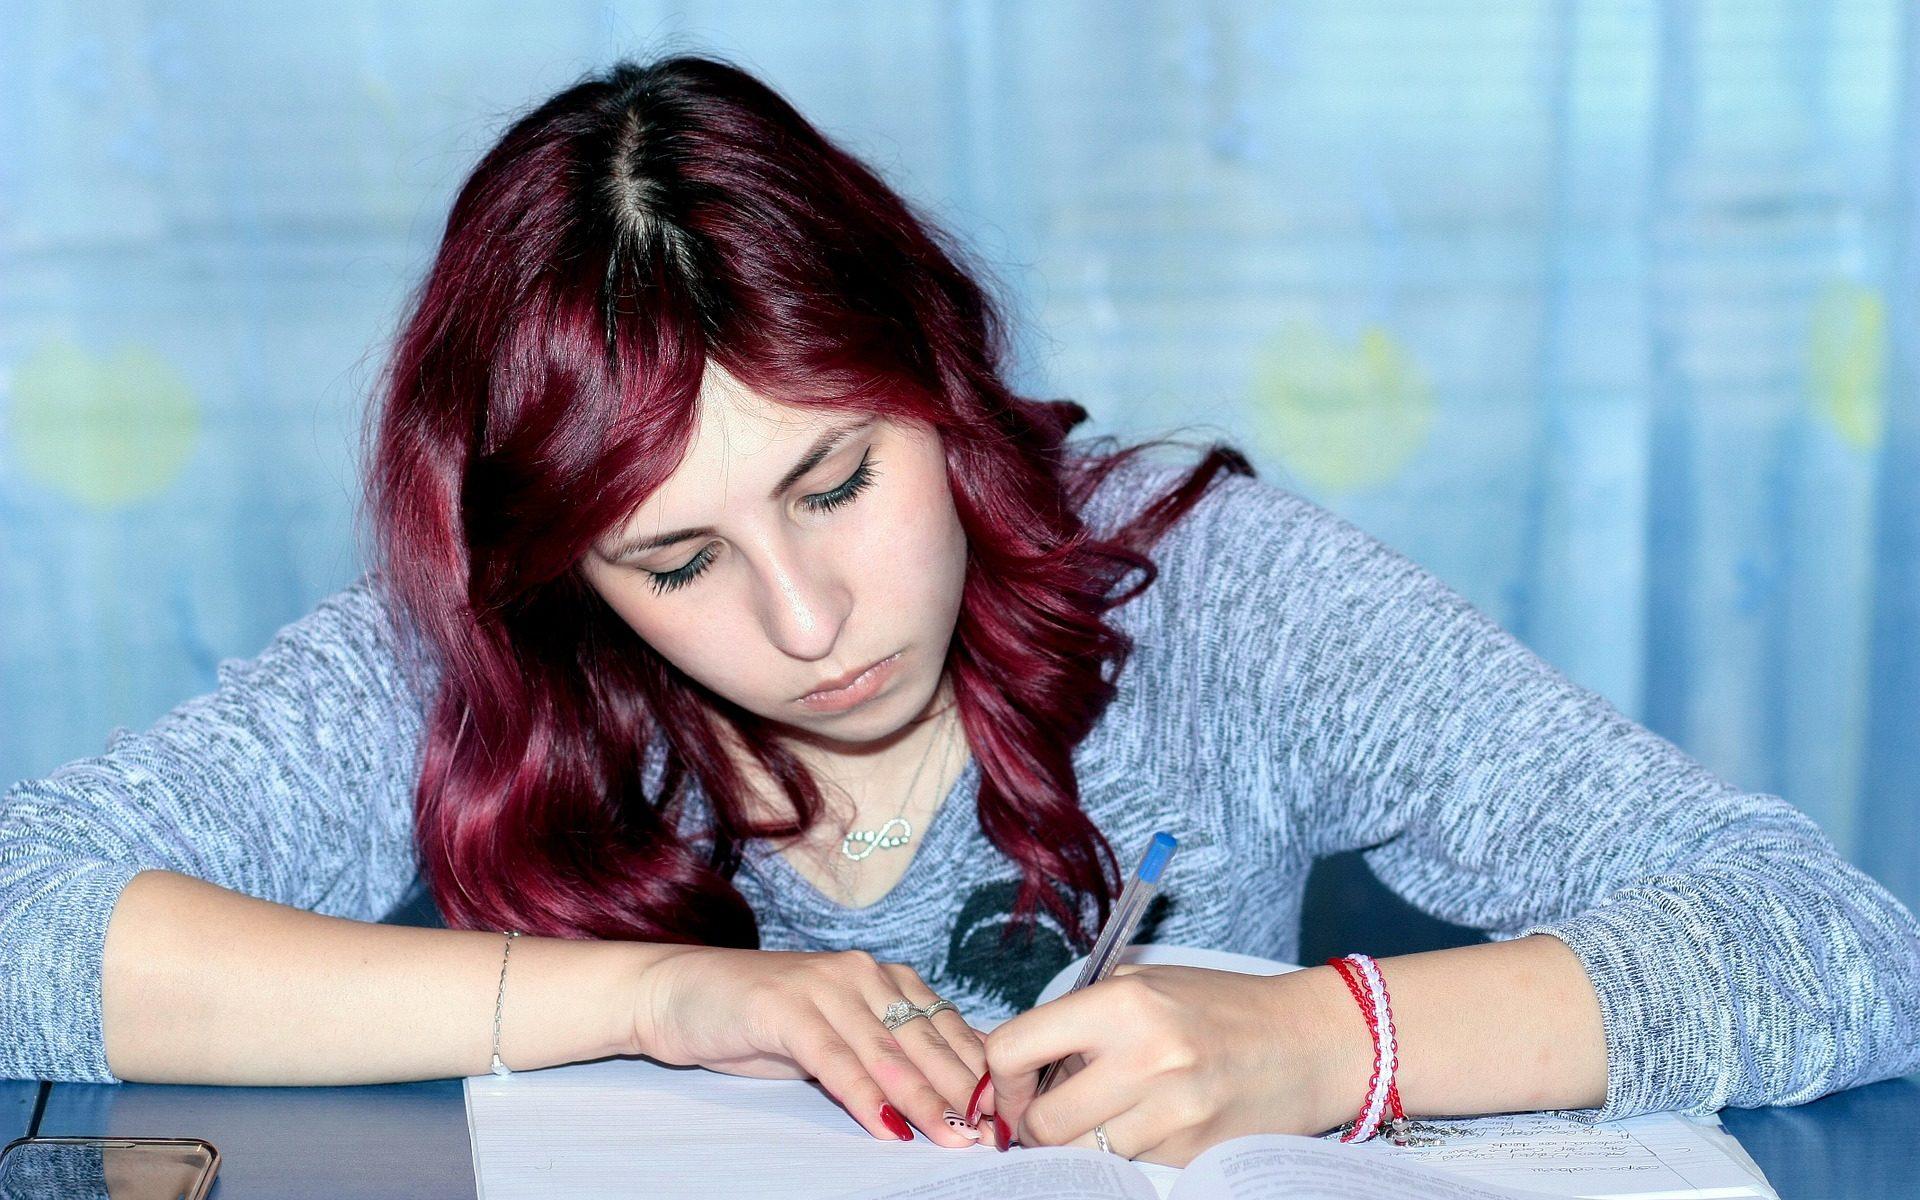 Kuvan lähde: pixabay.com https://pixabay.com/en/study-girl-writing-notebook-1231396/